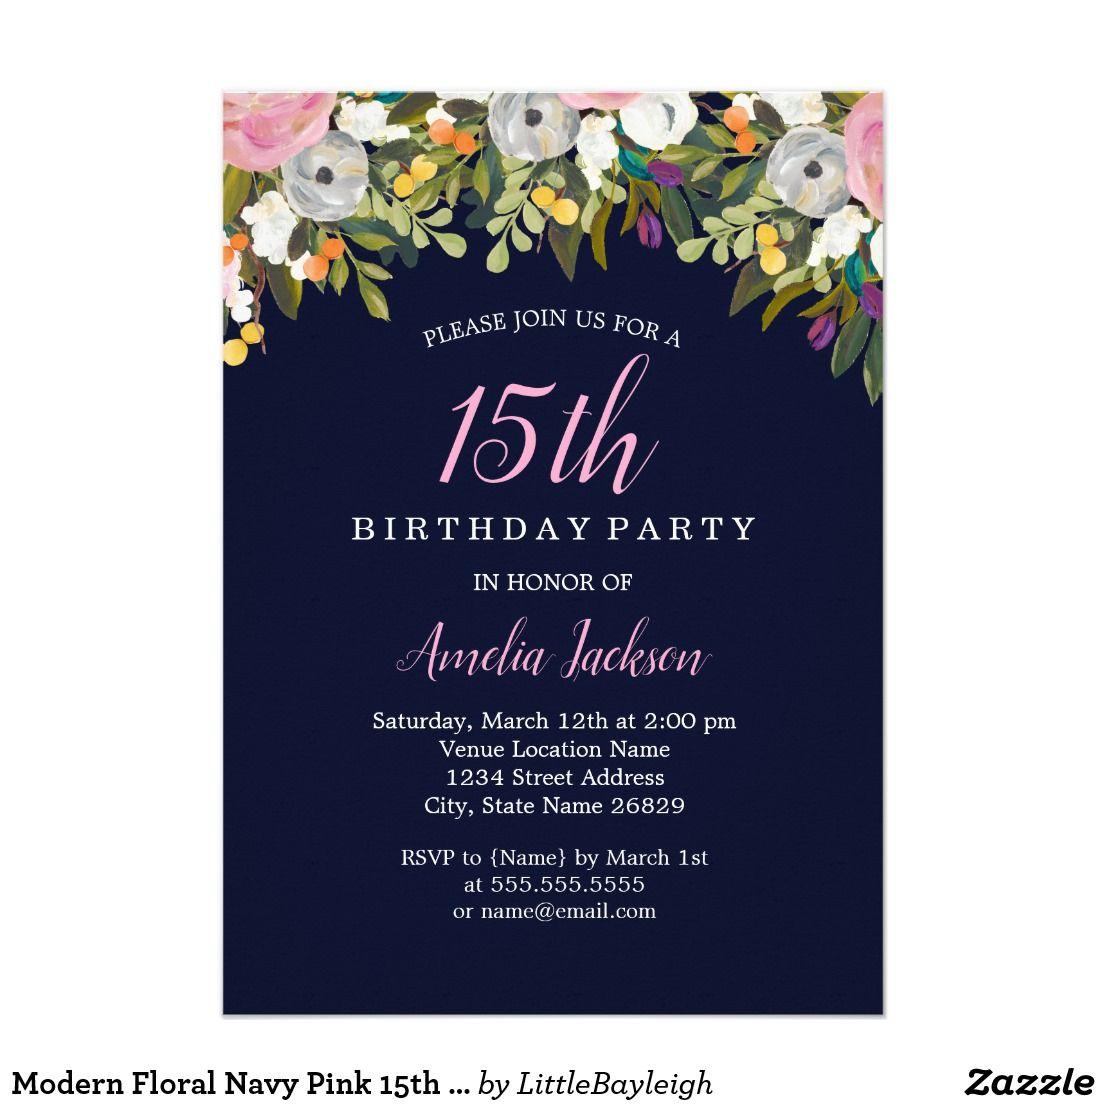 Modern Floral Navy Pink 15th Birthday Invitation   Pinterest   15th ...